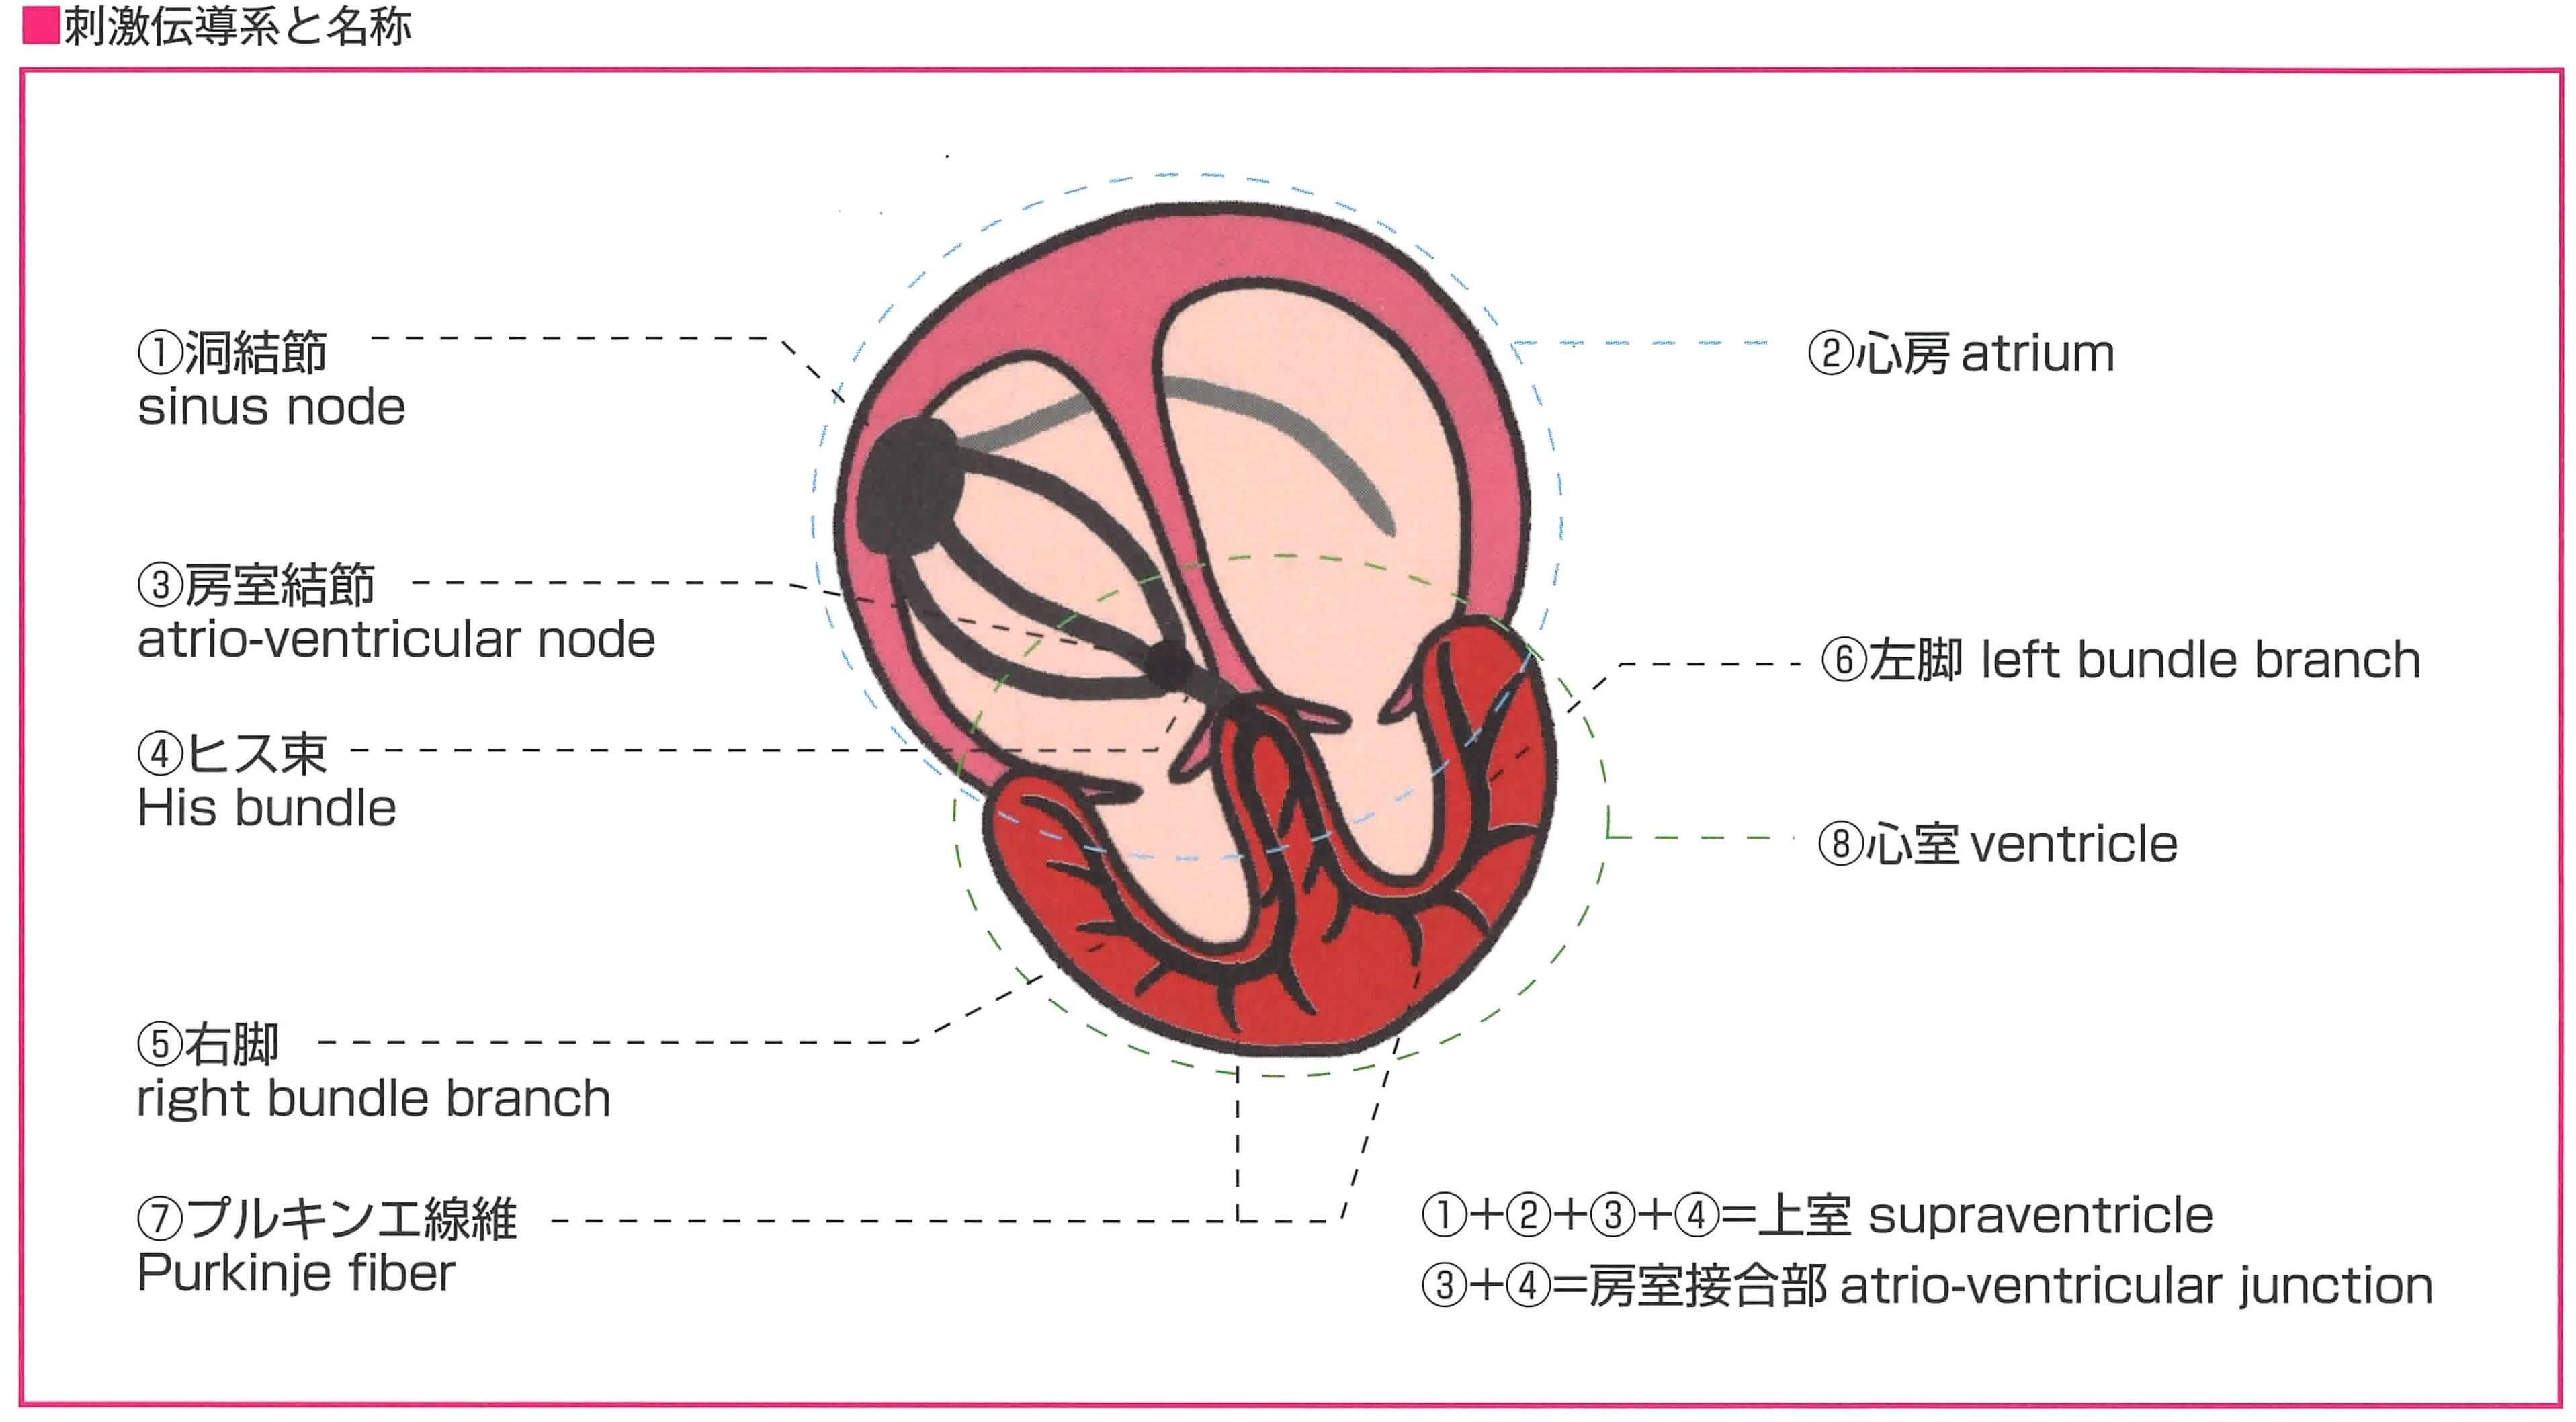 刺激伝導系の模式図